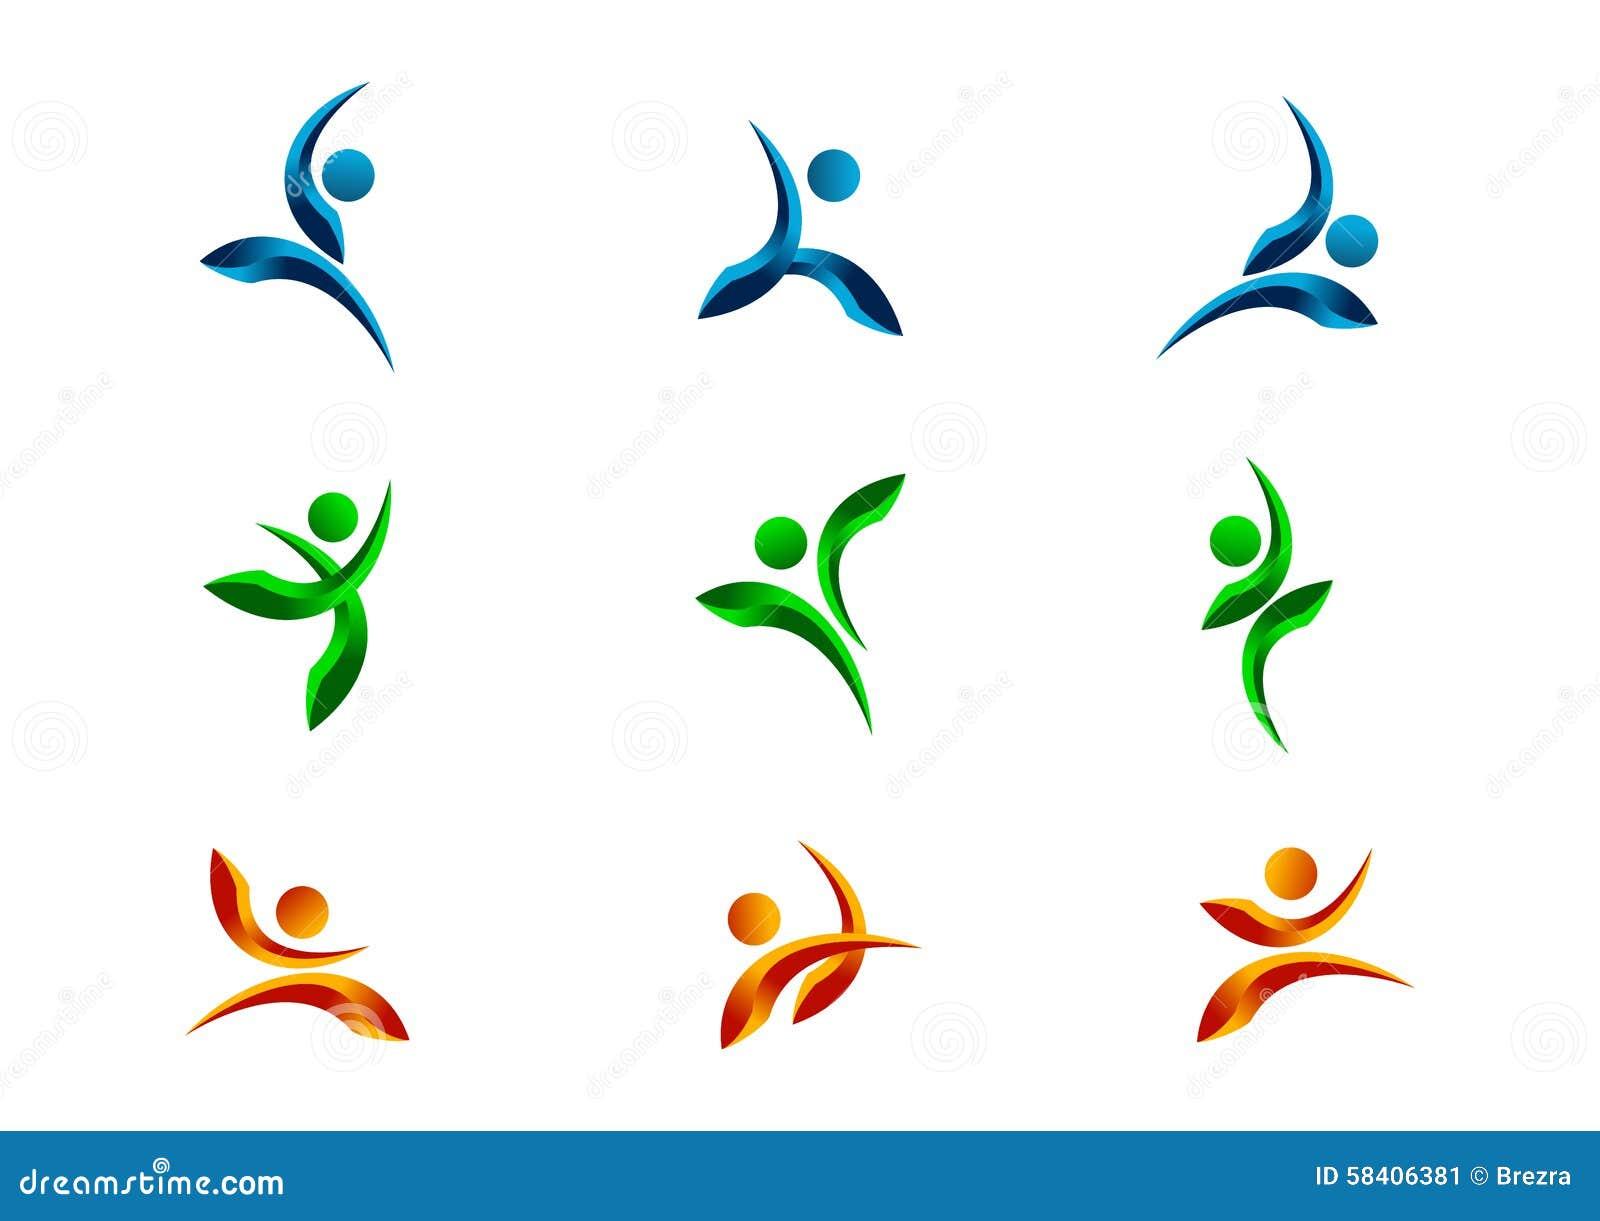 Aerobics dance 3d - 3 4